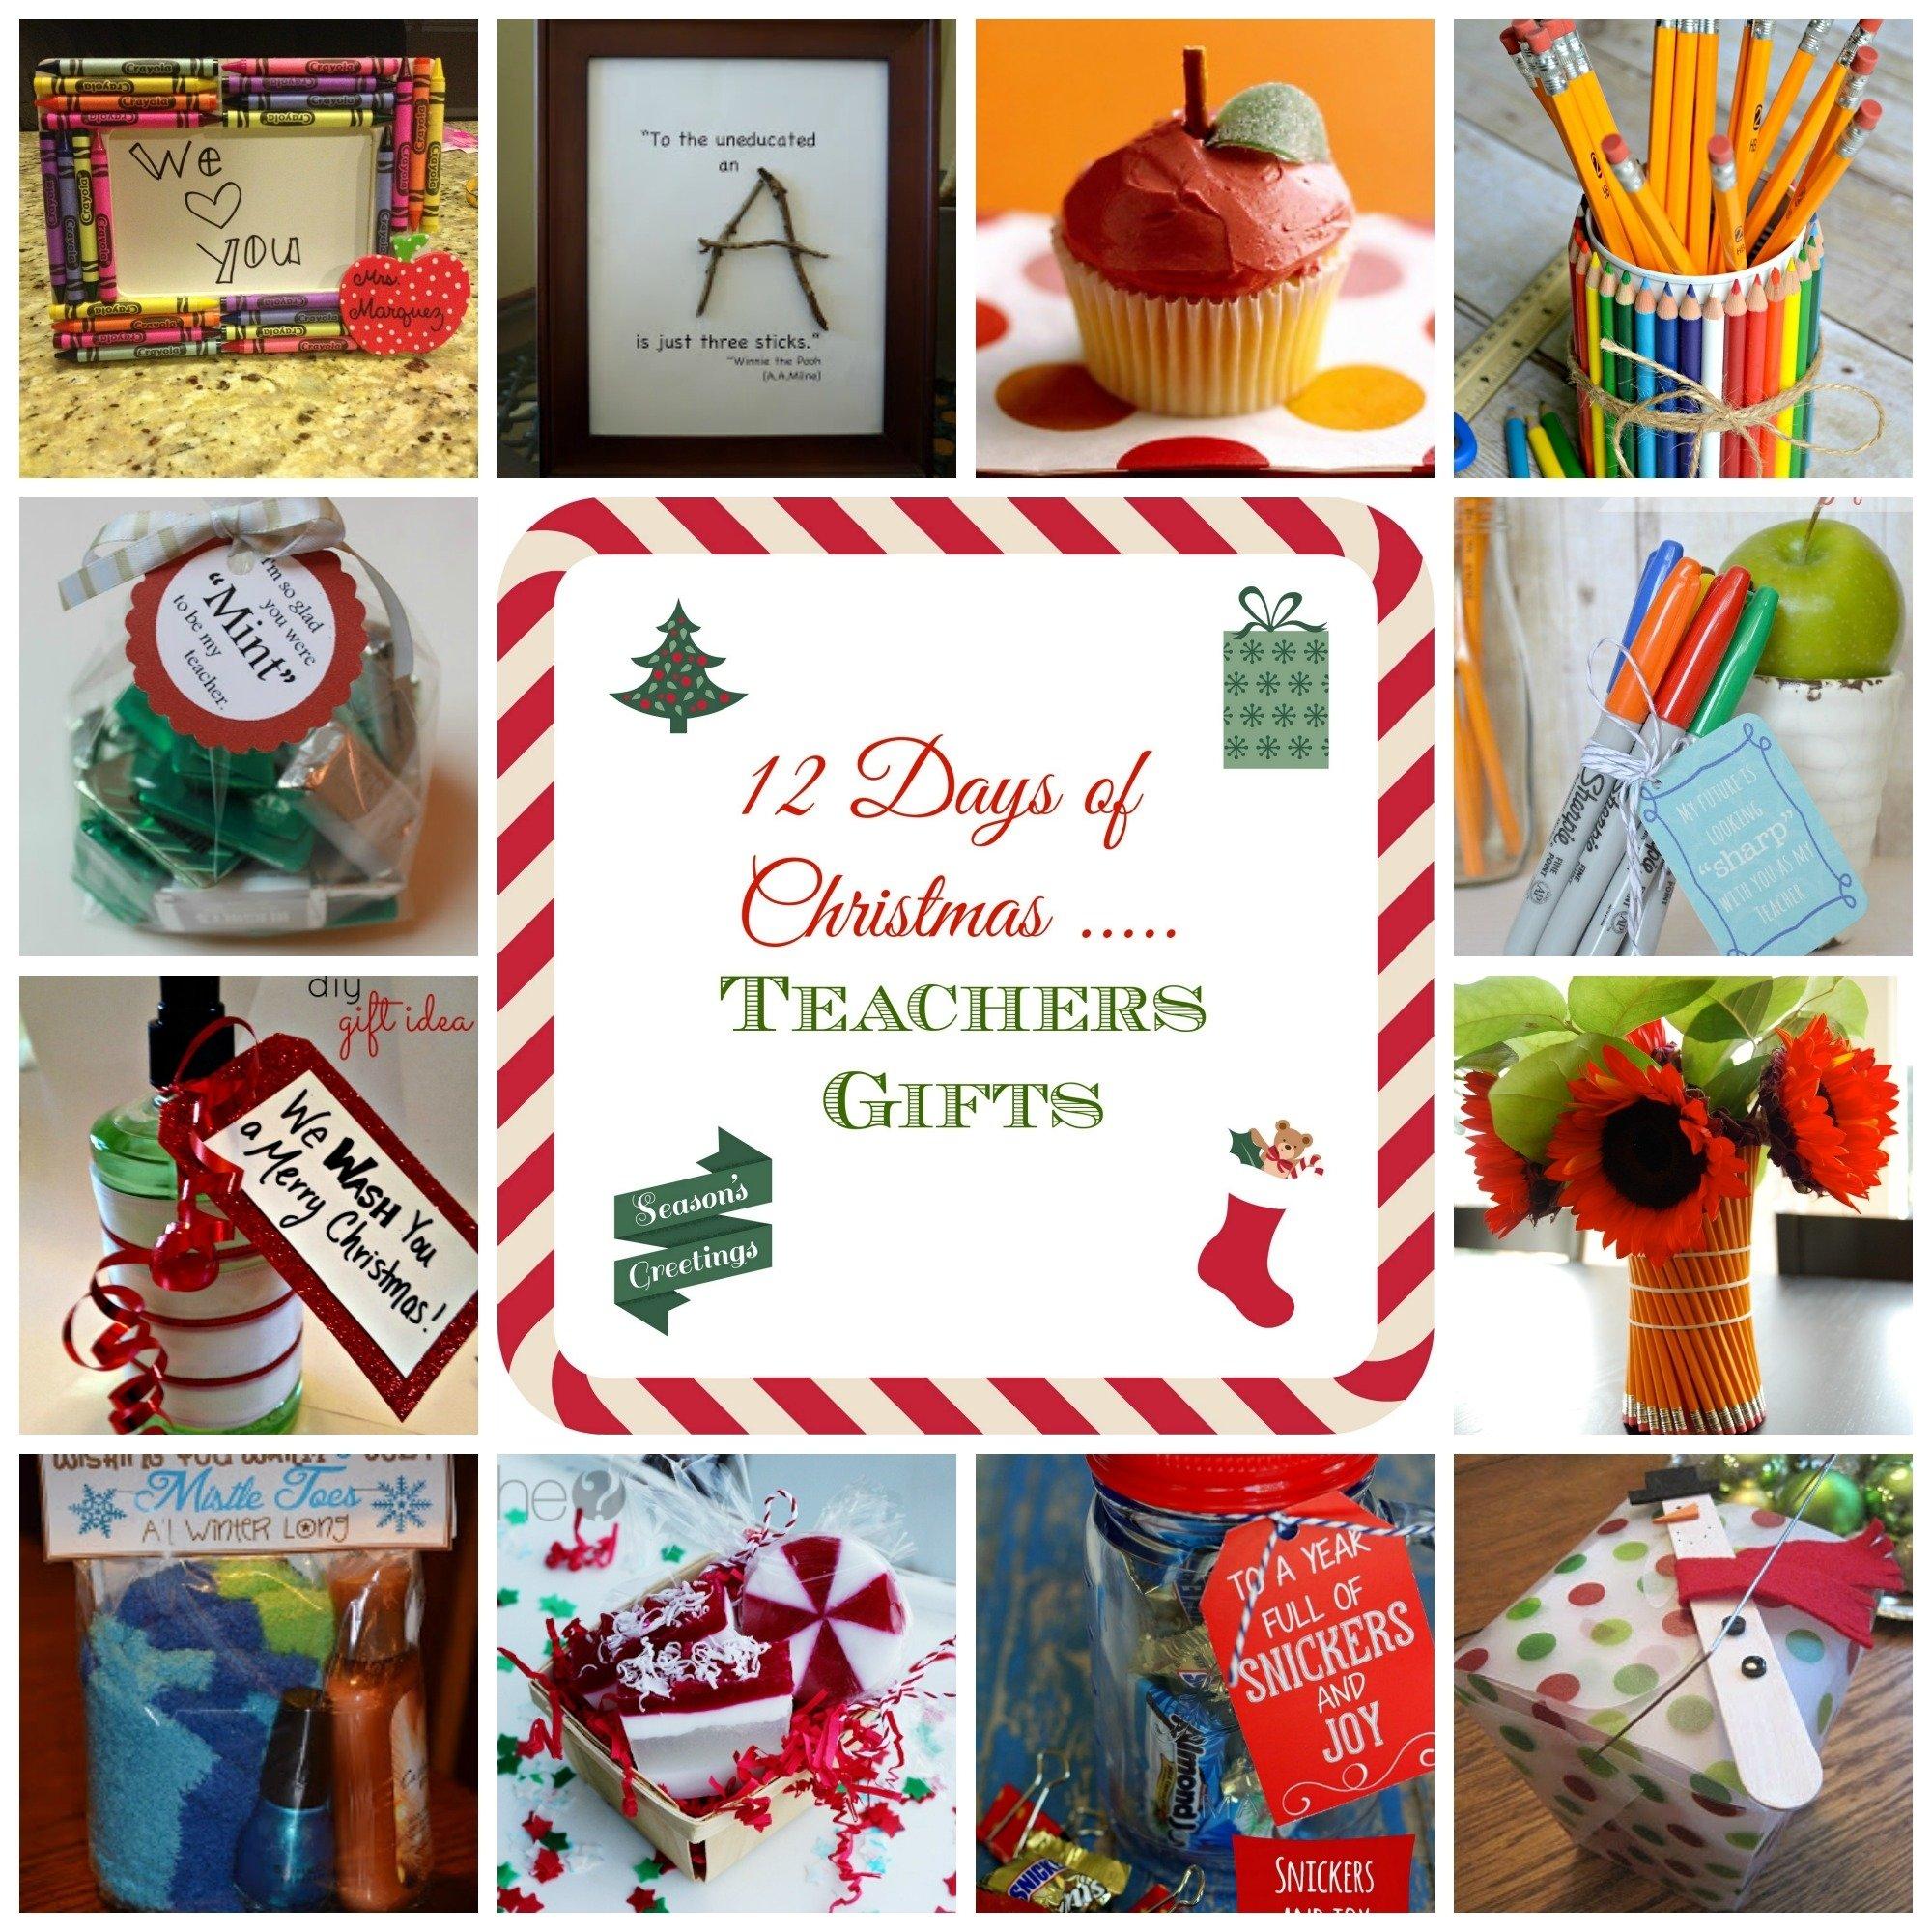 10 Spectacular 12 Days Of Christmas Gifts Ideas 12 days of christmas teacher gift ideas donnahup 1